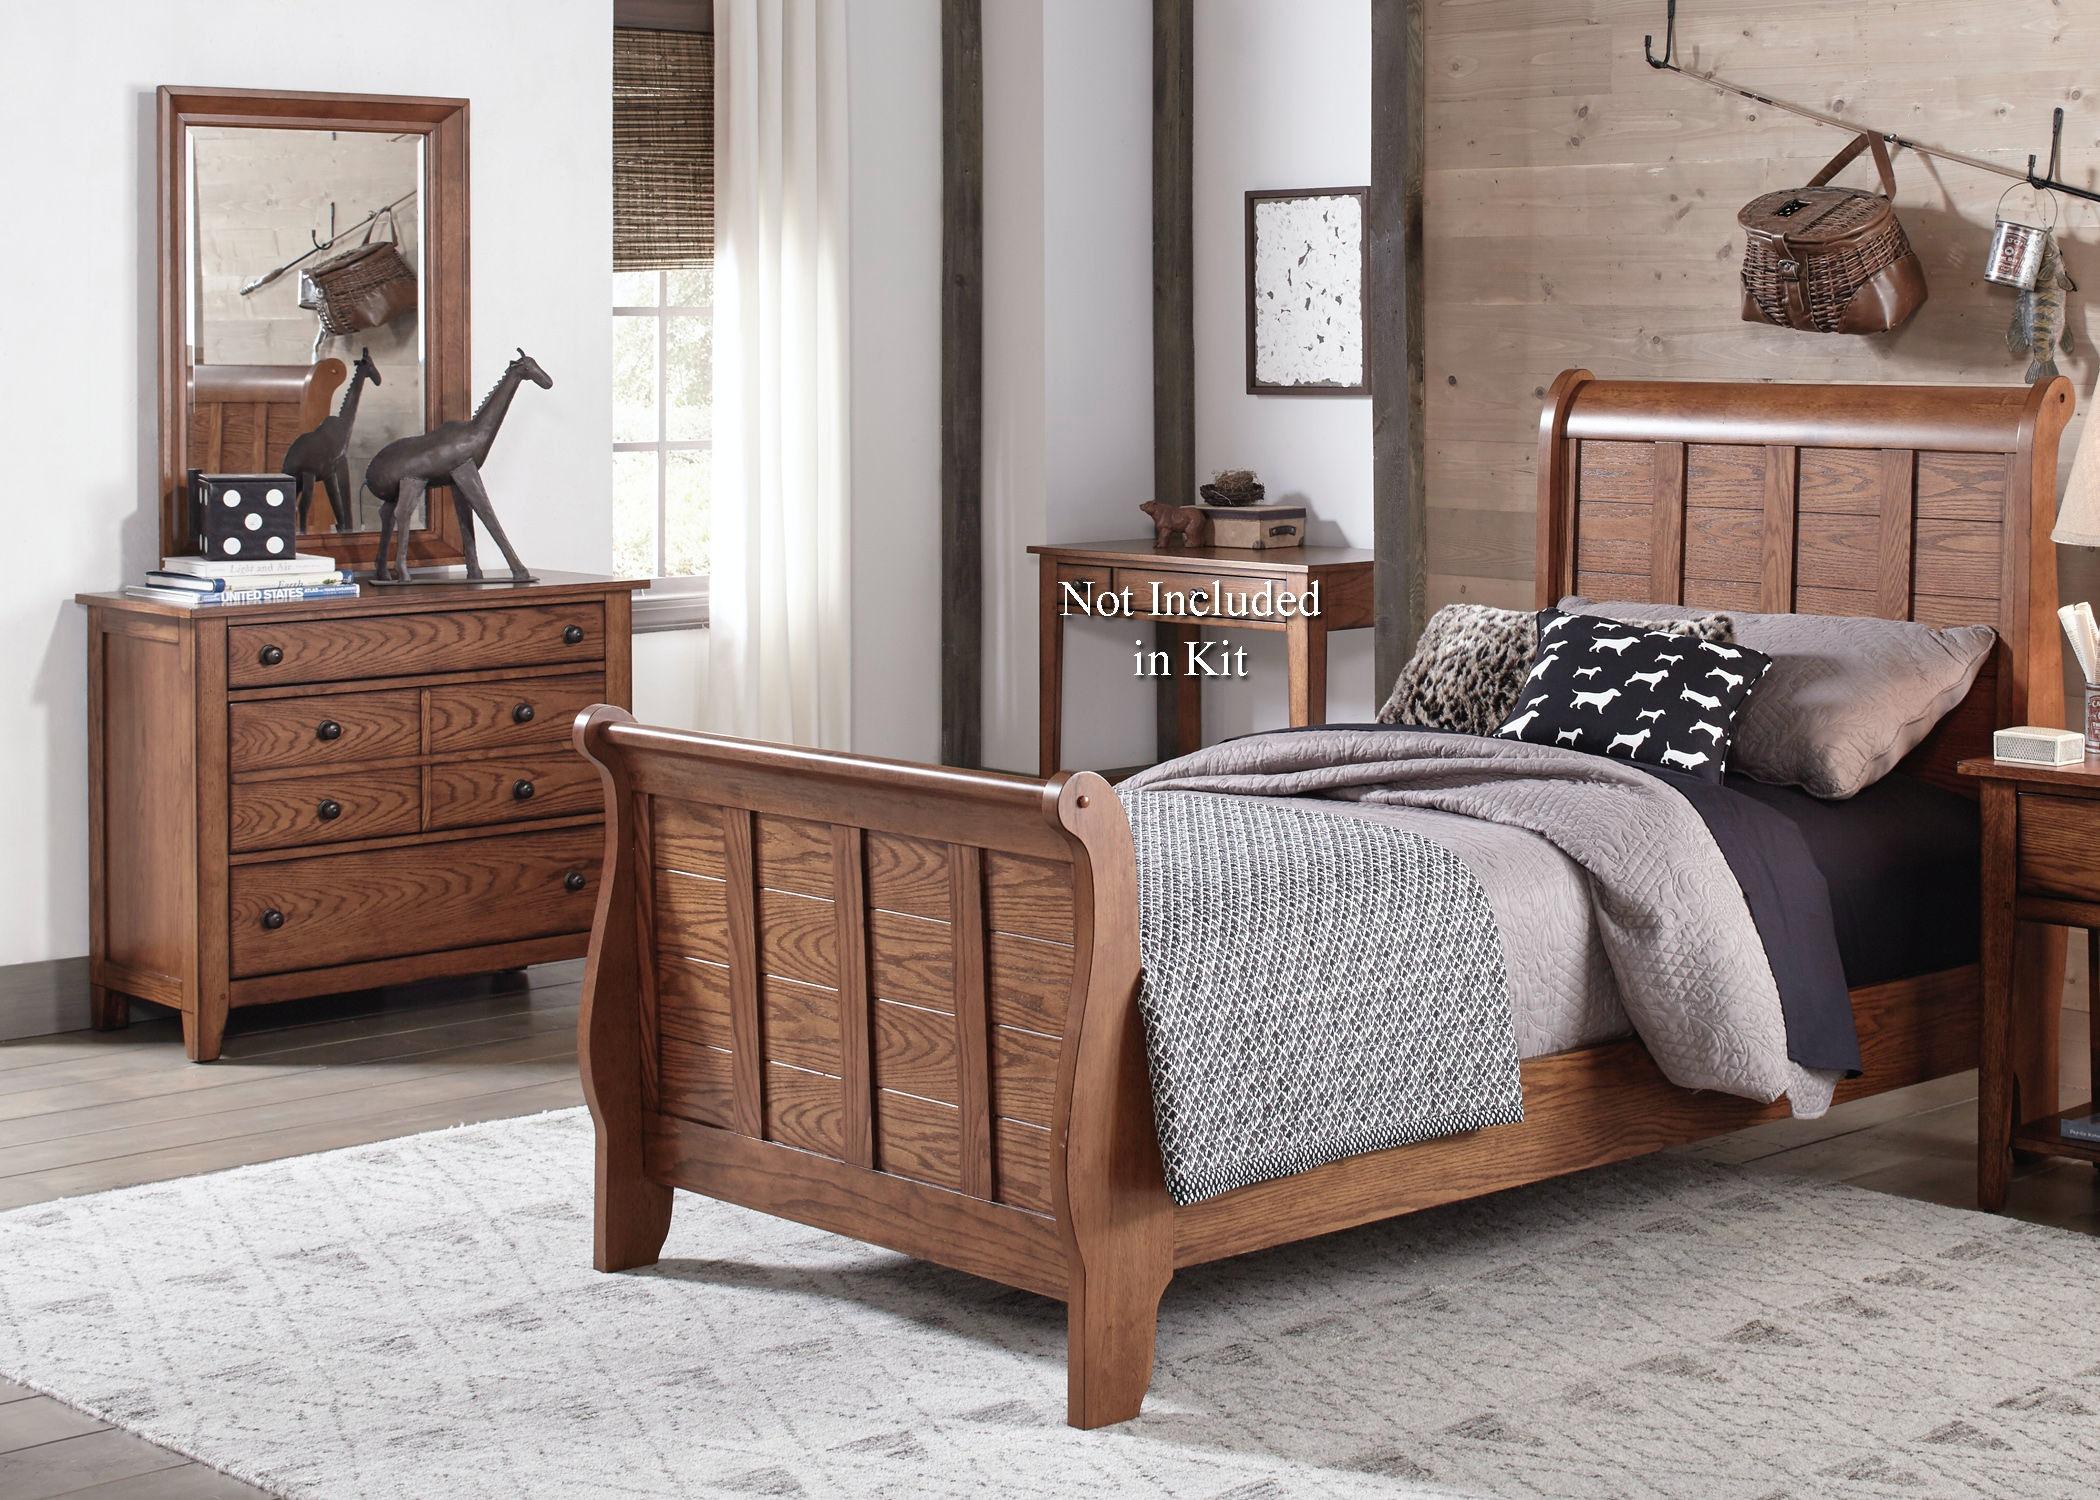 Liberty Furniture Full Sleigh Bed, Dresser And Mirror 175 YBR FSLDM